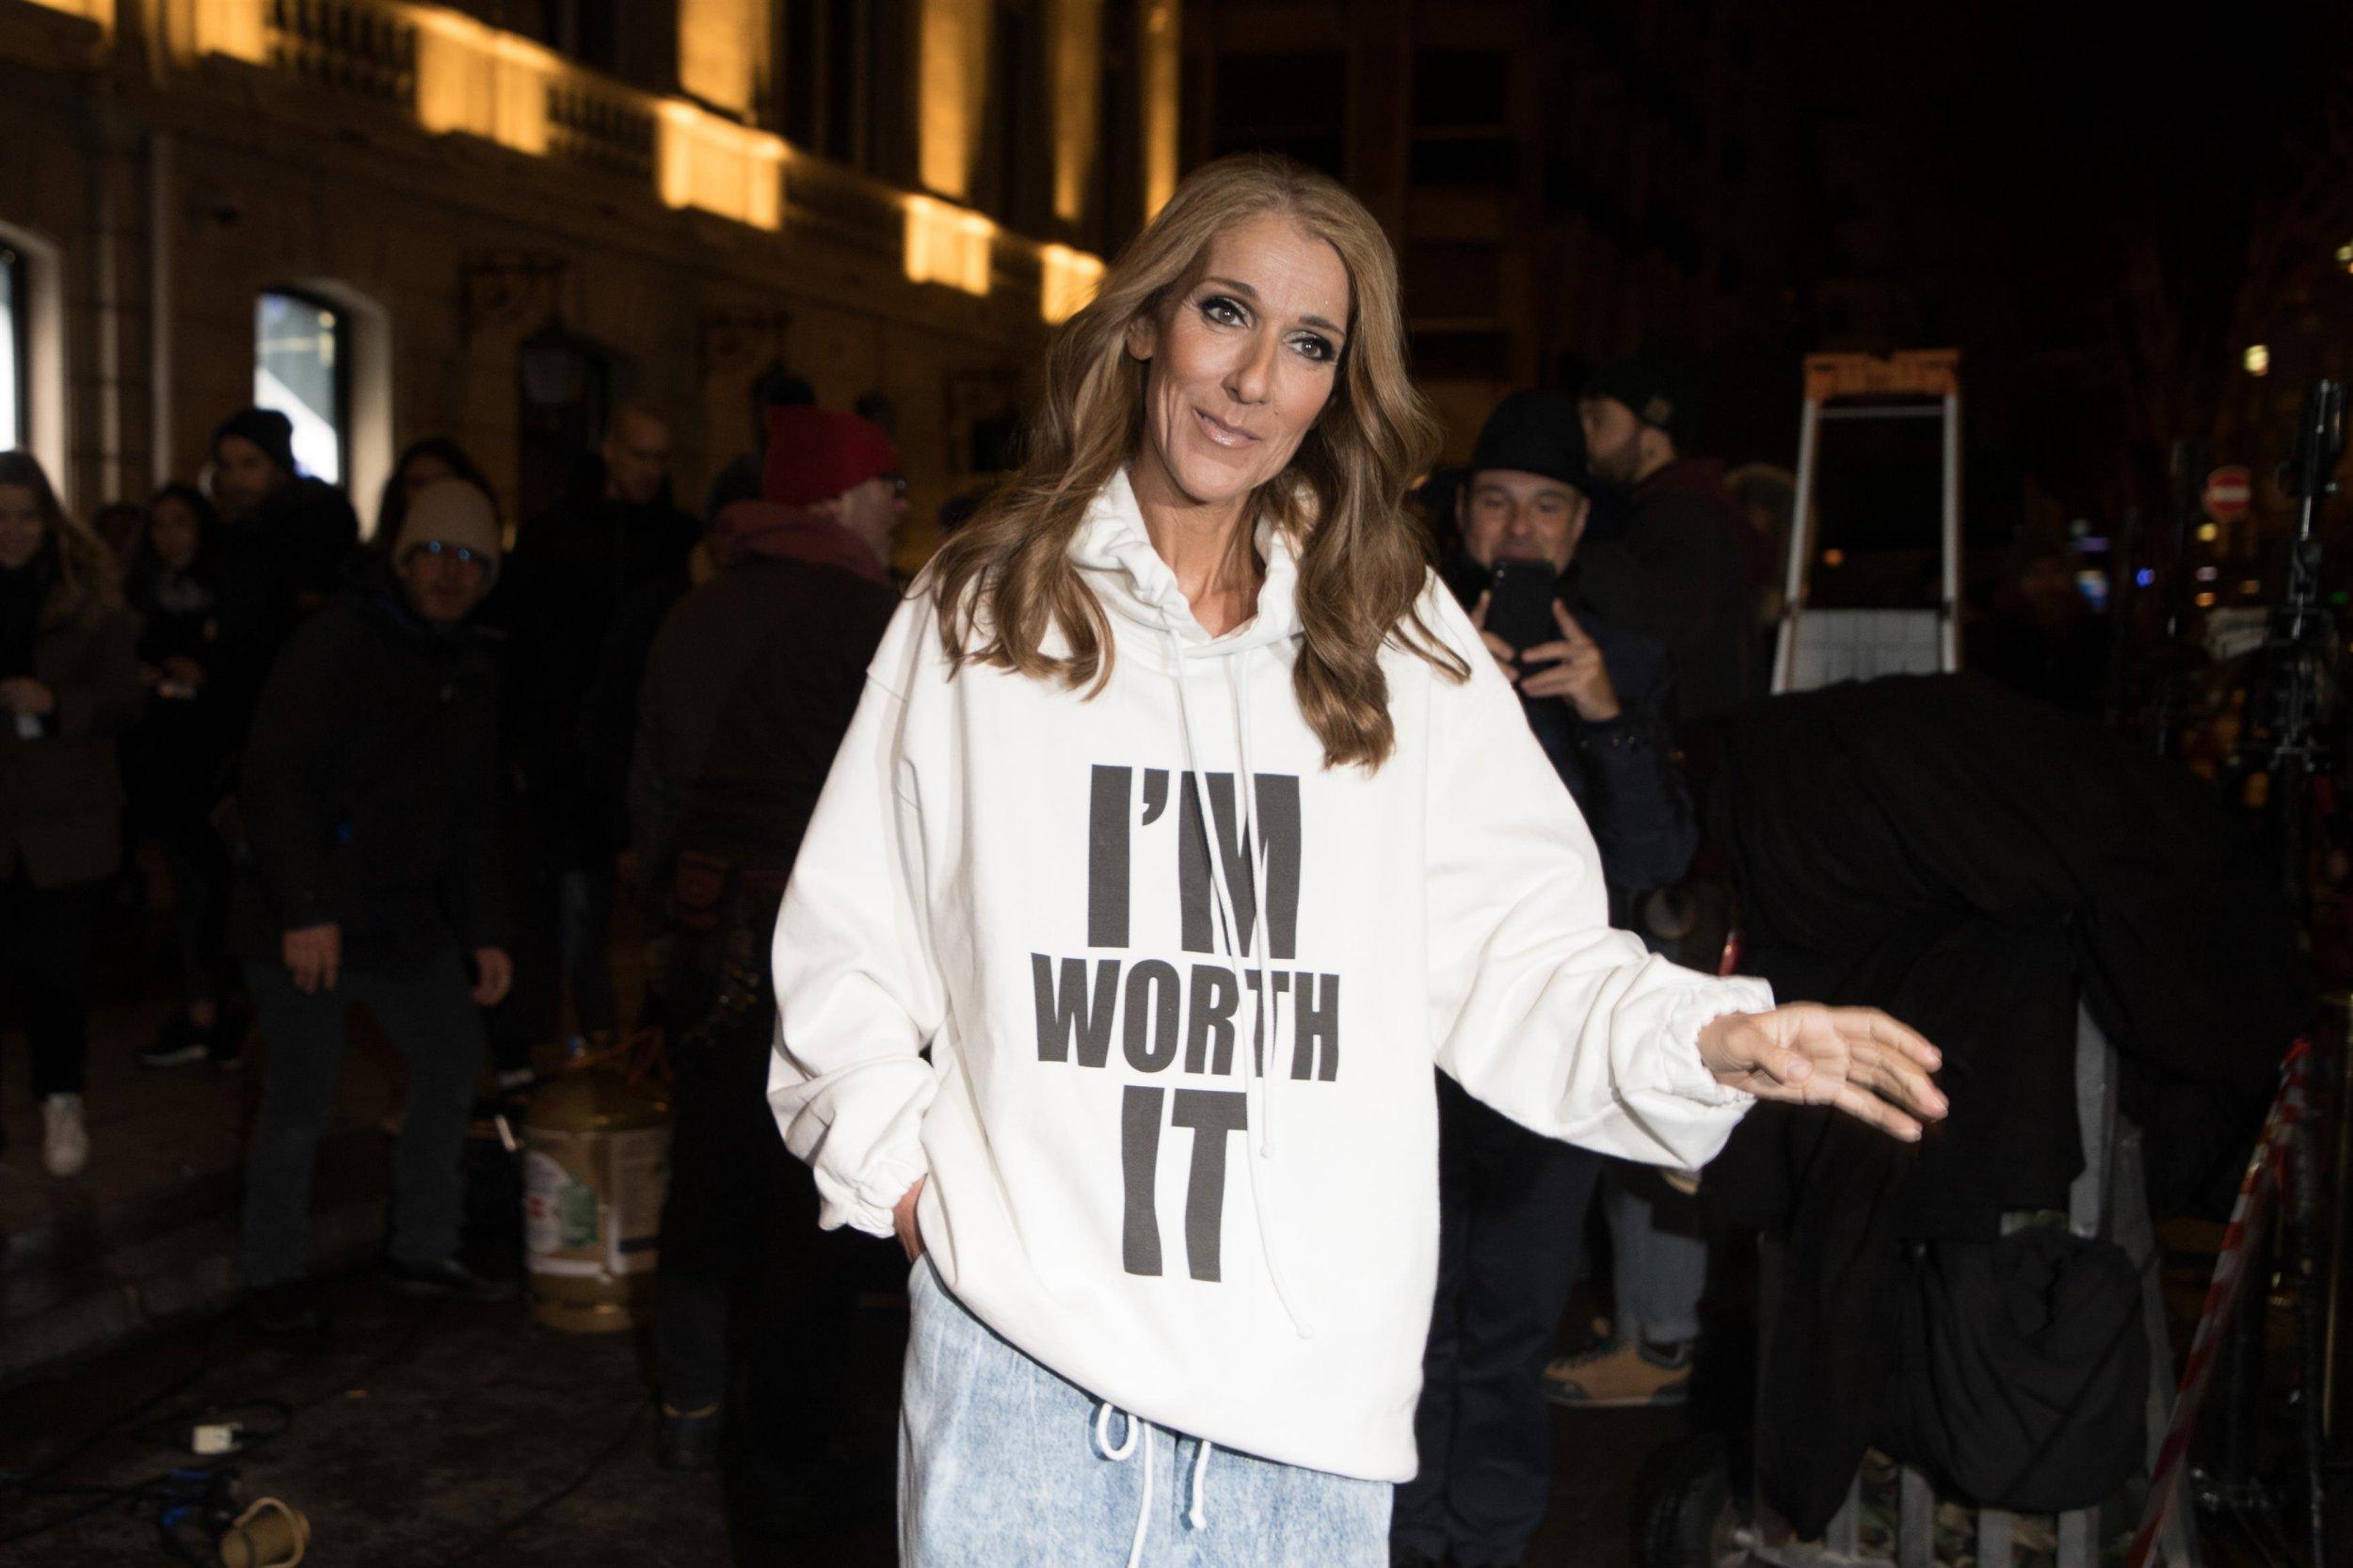 Celine Dion at L'oreal shoot in Paris